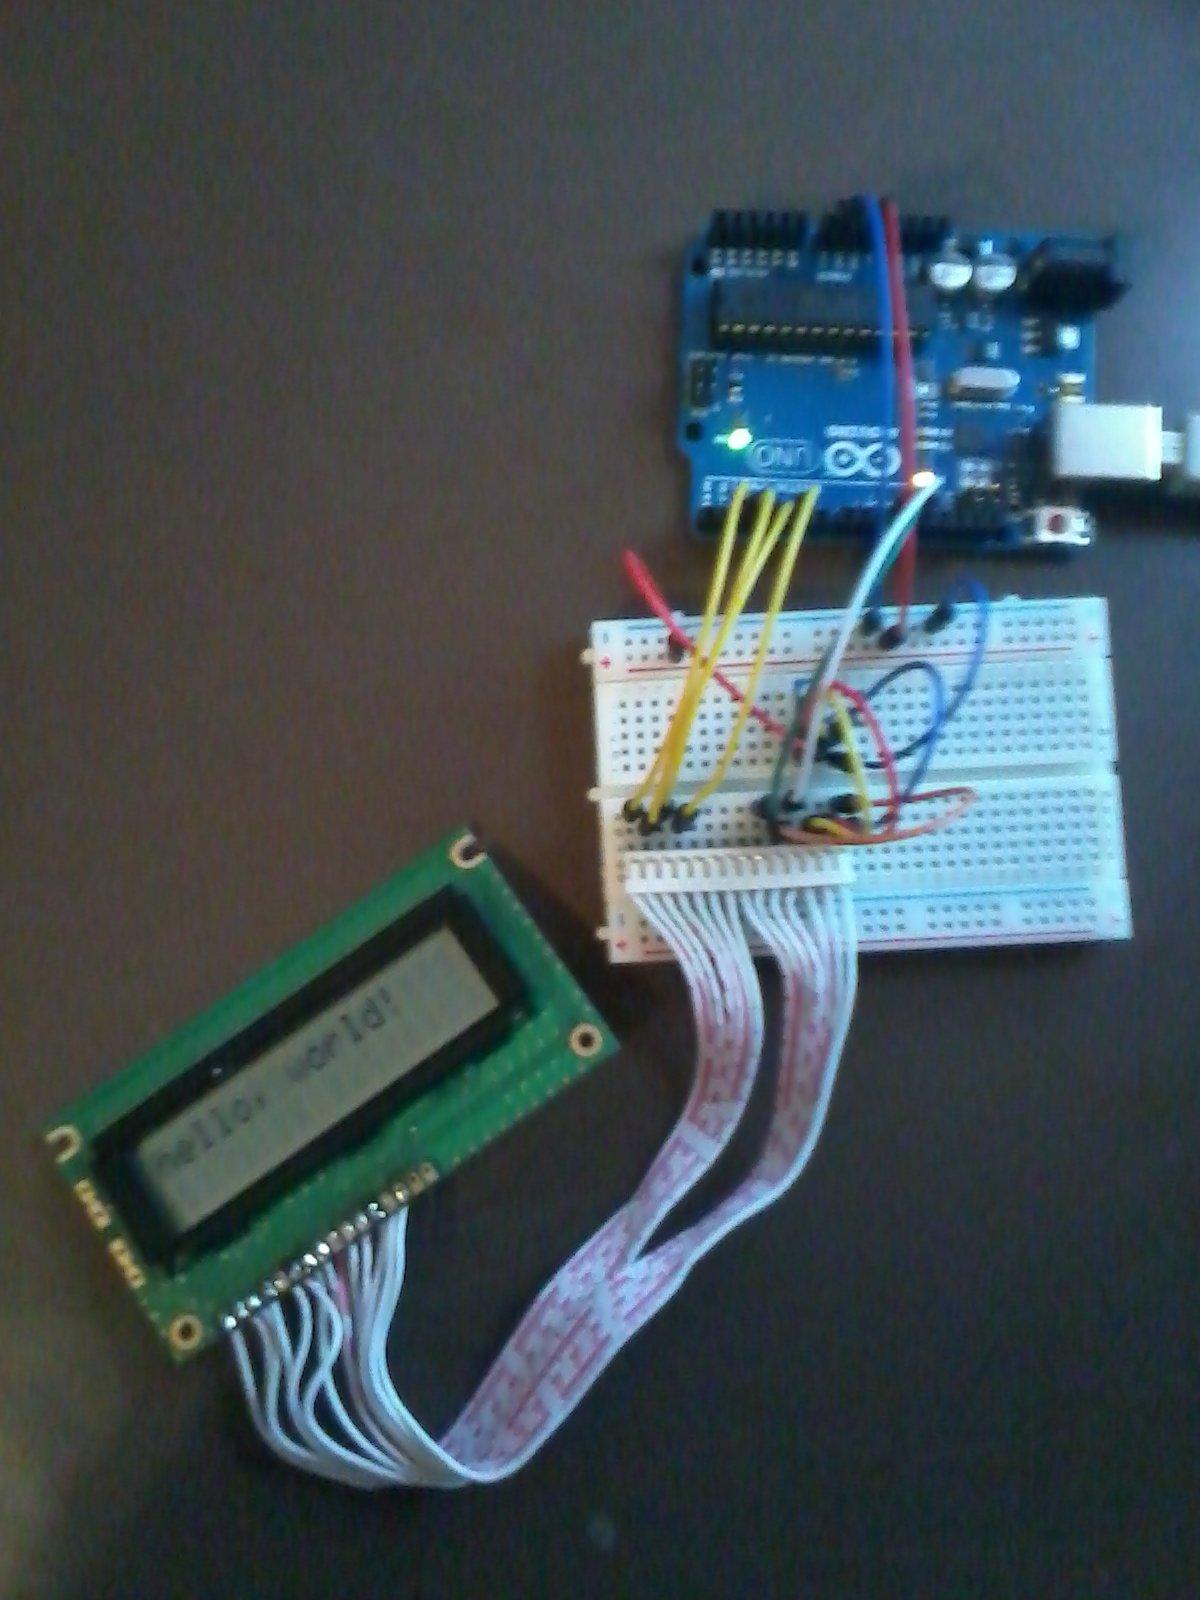 Geek en formación primeros experimentos con arduino